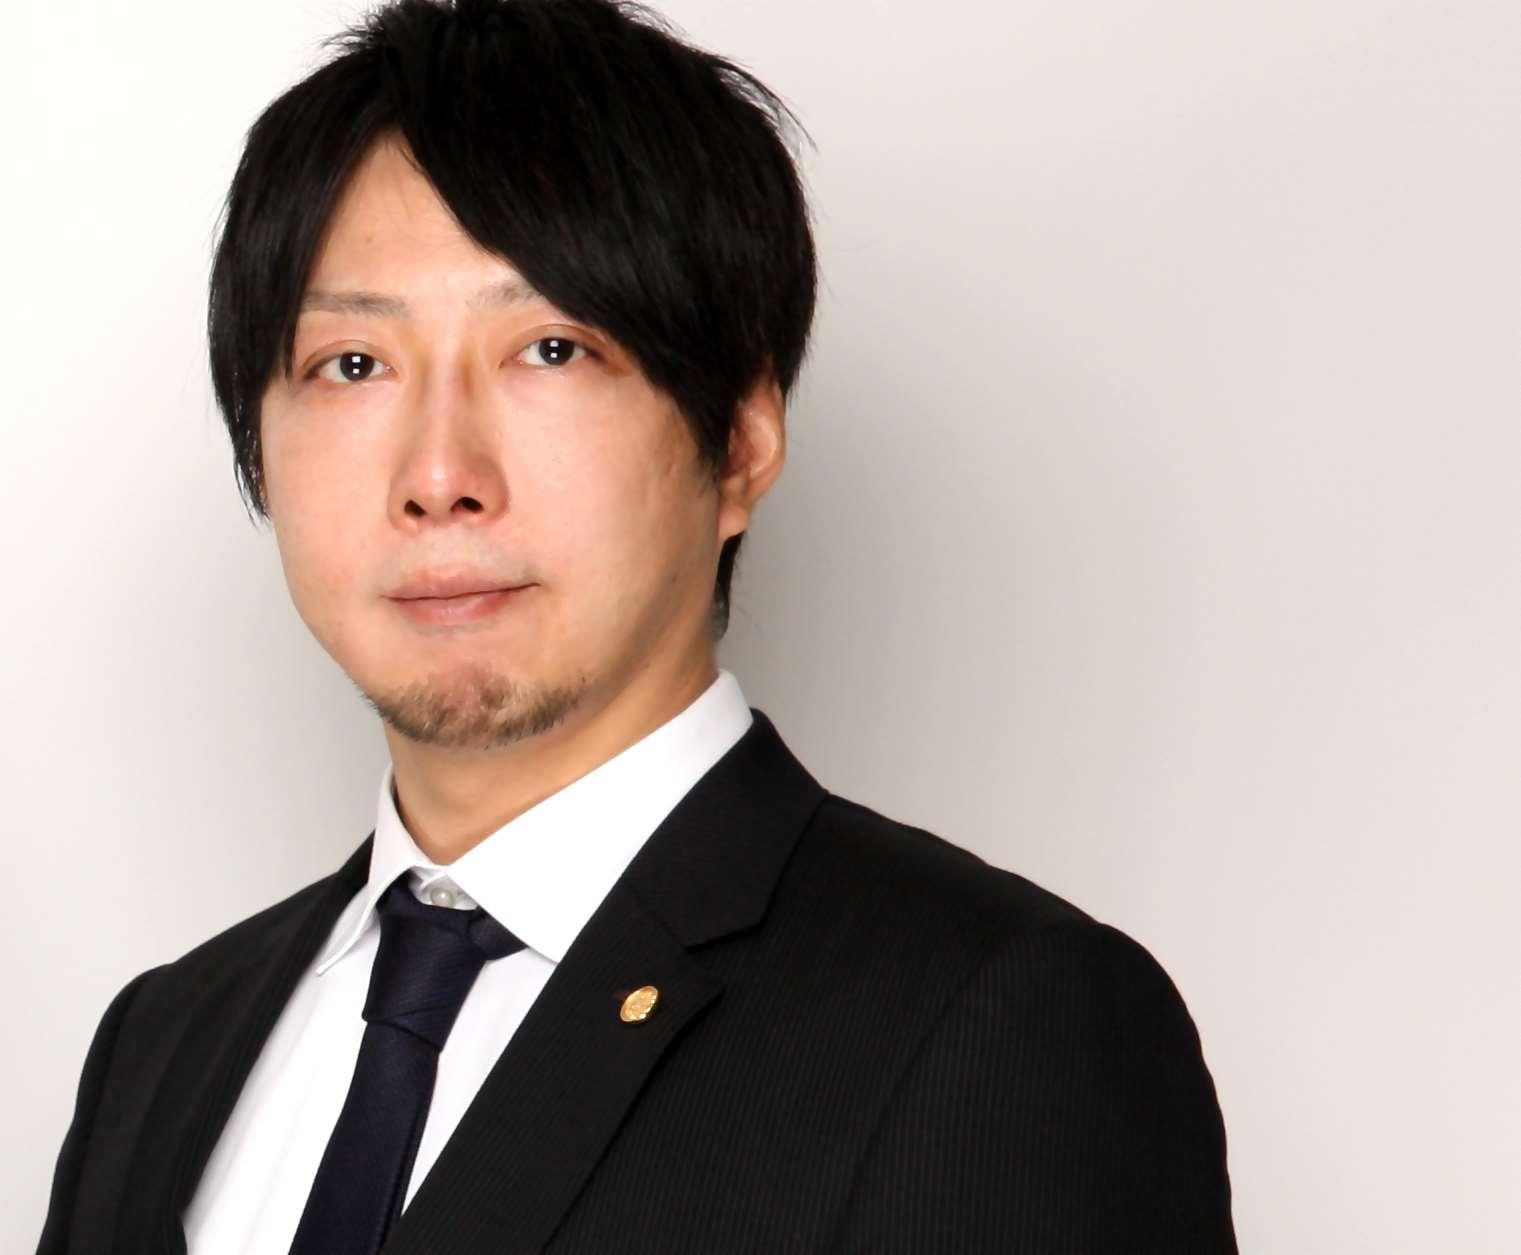 Okada Yuima